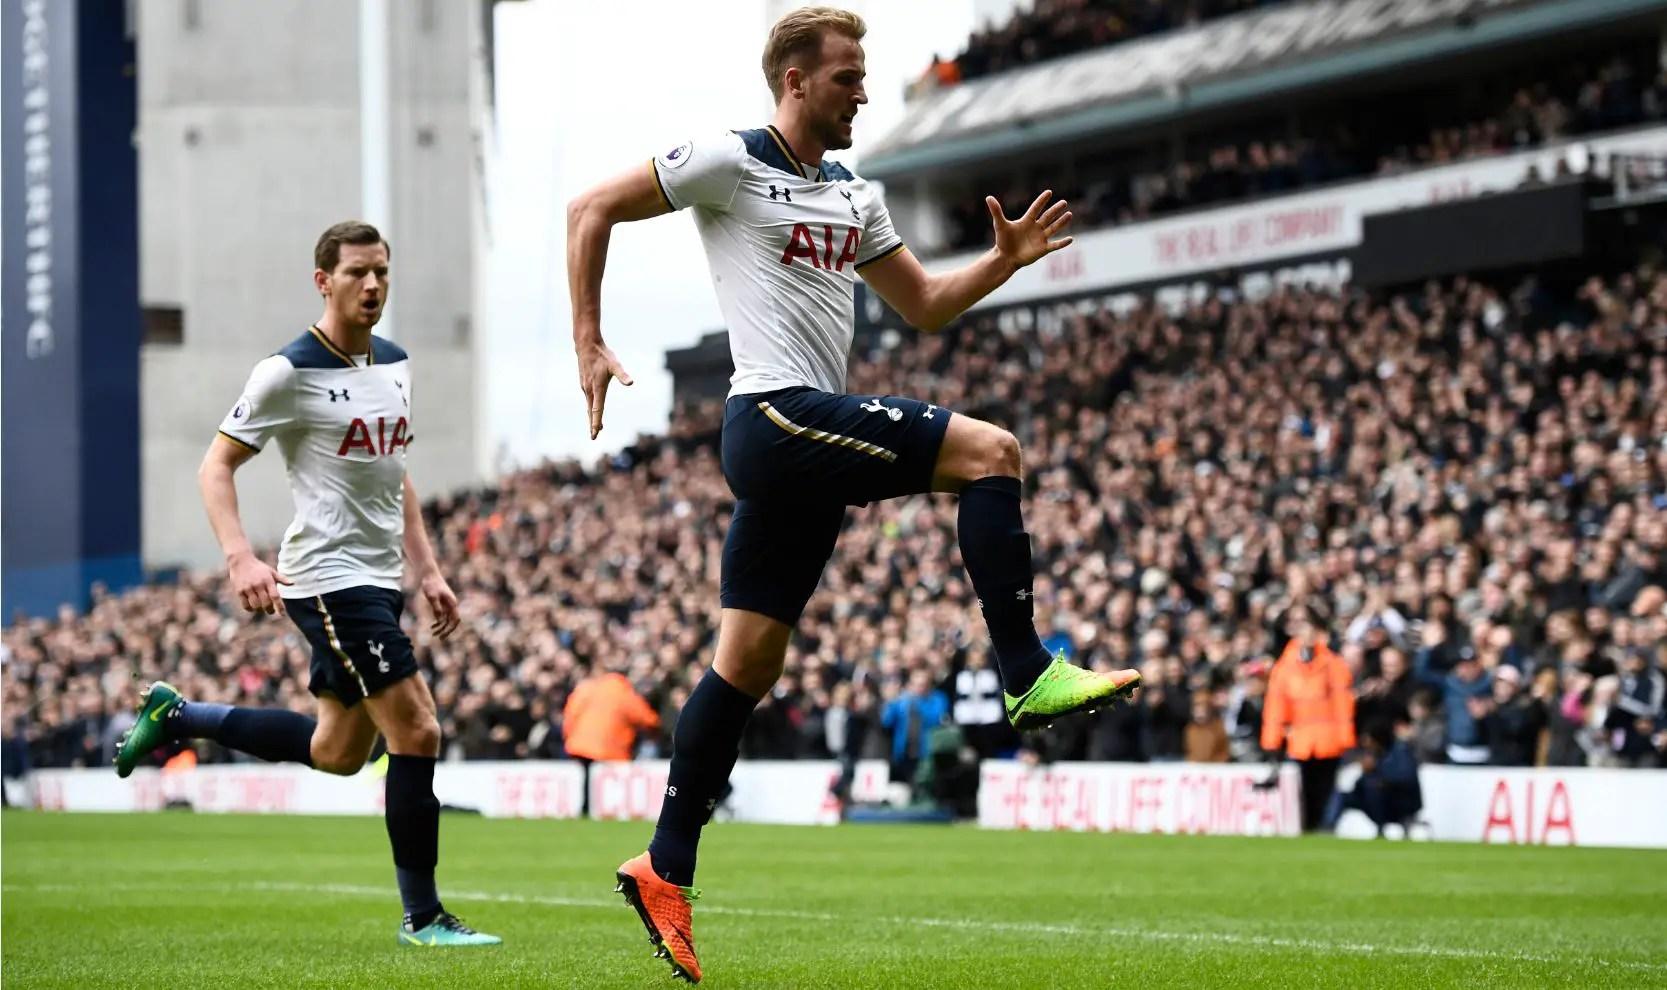 Kane Hits Hat-trick As Spurs Thrash Stoke, Go Second